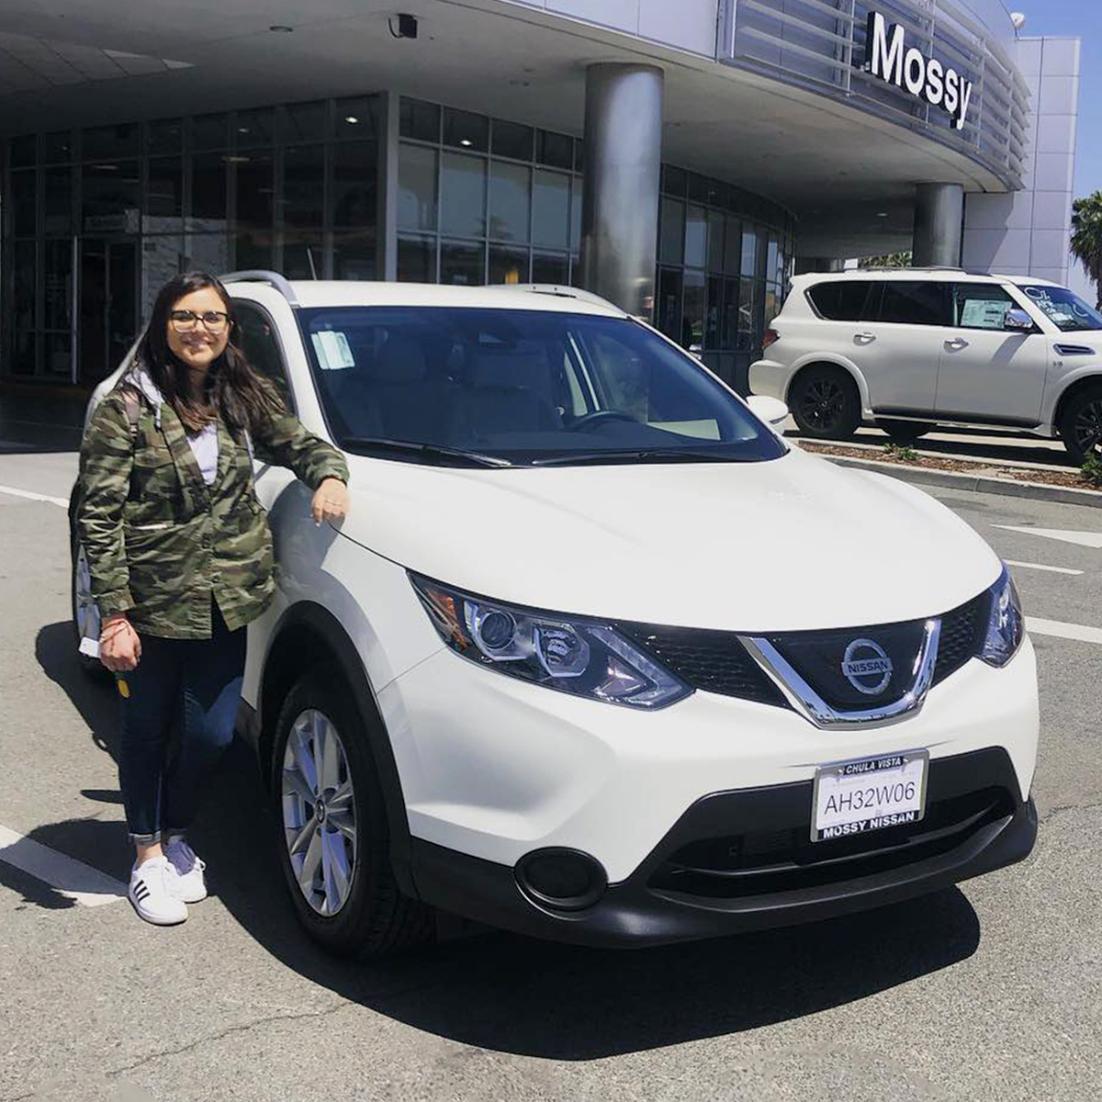 Nissan Chula Vista >> Flashback Friday Our Favorite Flashbacks Include Happy